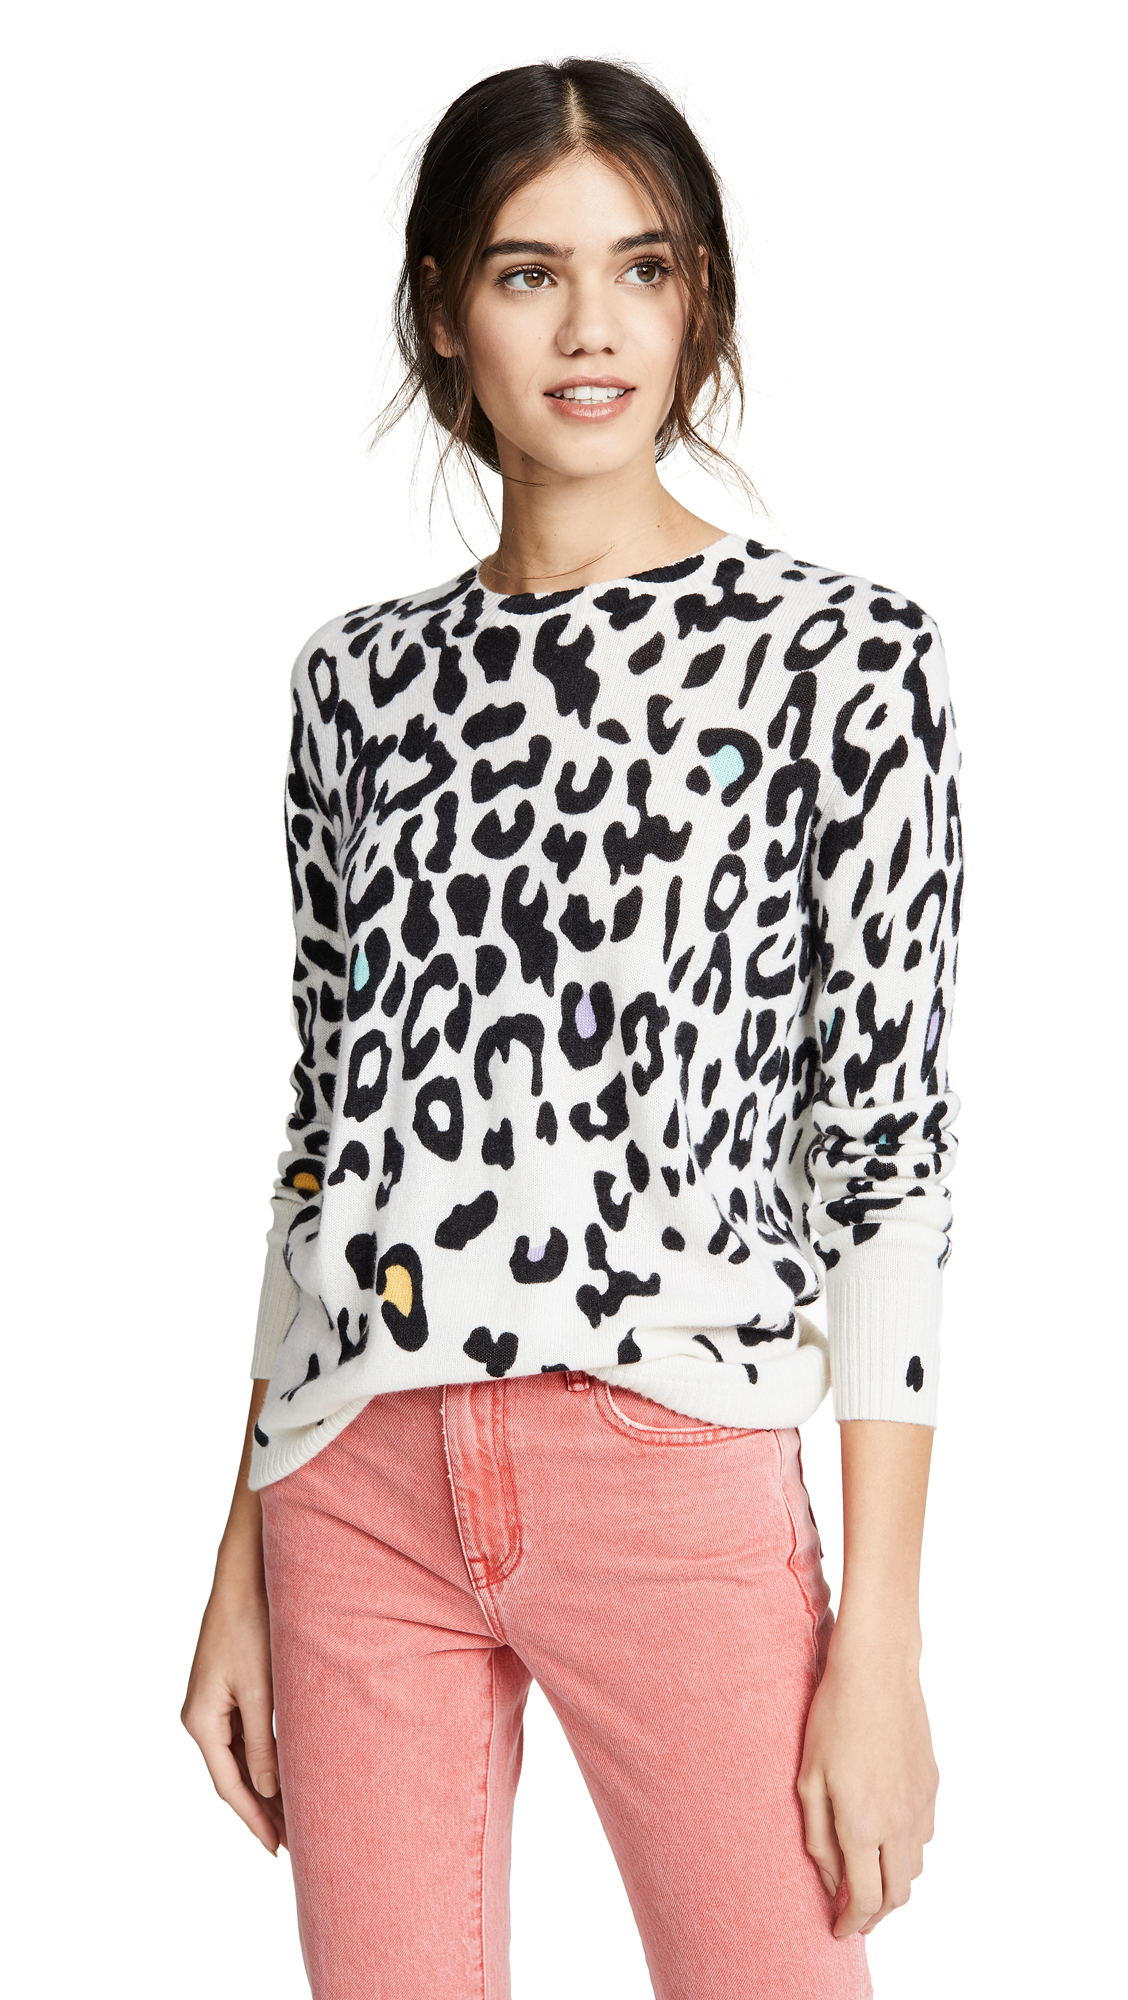 Autumn Cashmere Cashmeres Leopard Cashmere Sweater